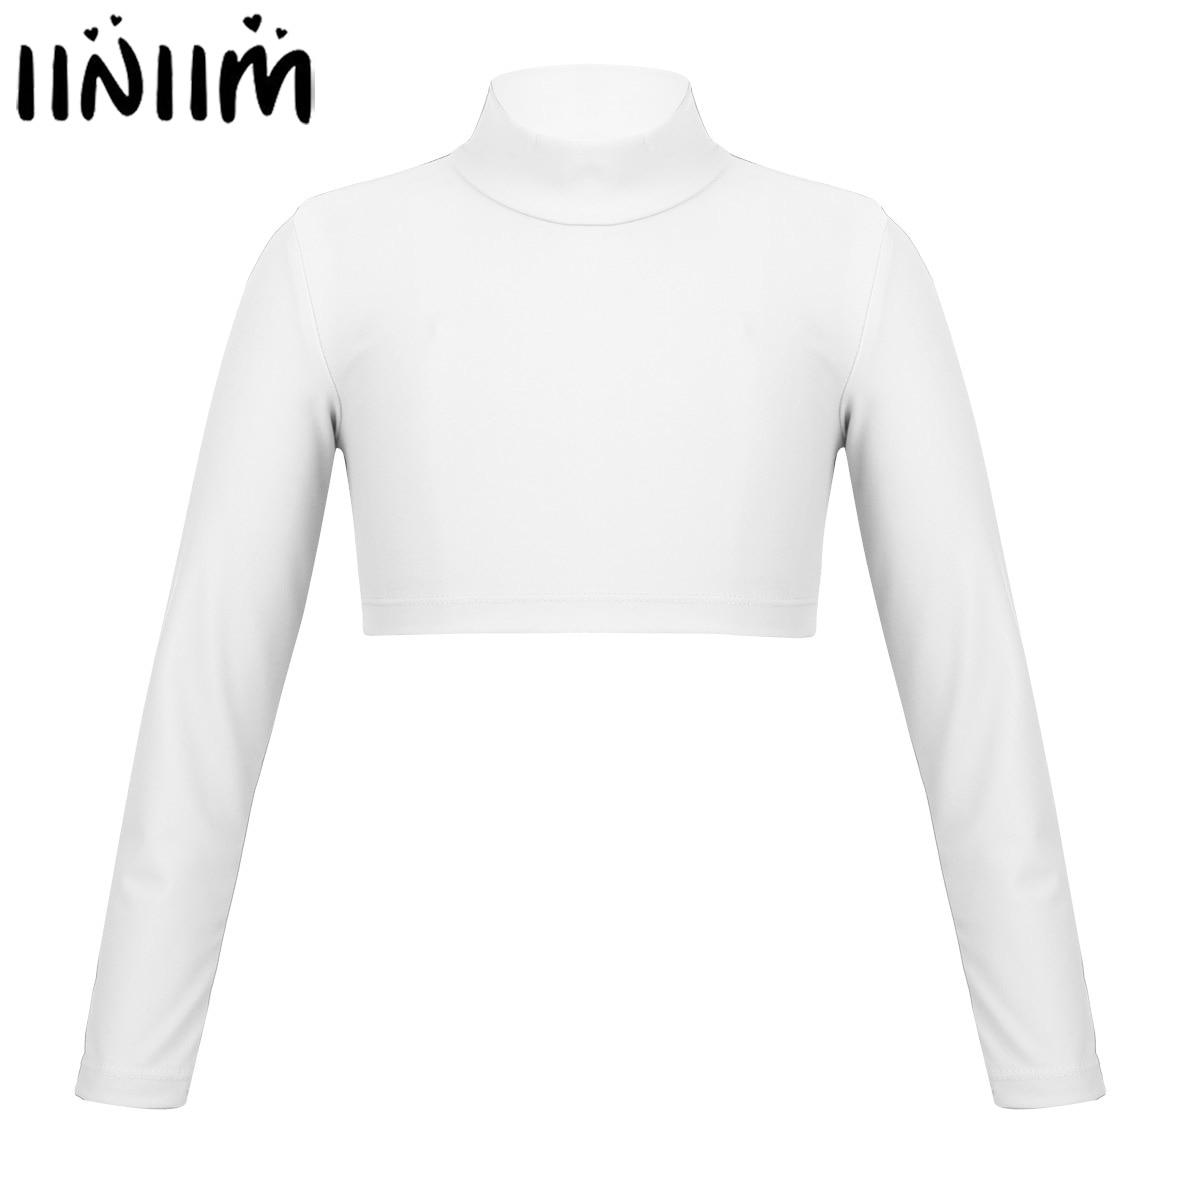 iiniim Girls Ballet Dance Wear Polo Neck Crop Top for Dancing Stage Performance Ballet Gymnastics Leotard Tops for Kids